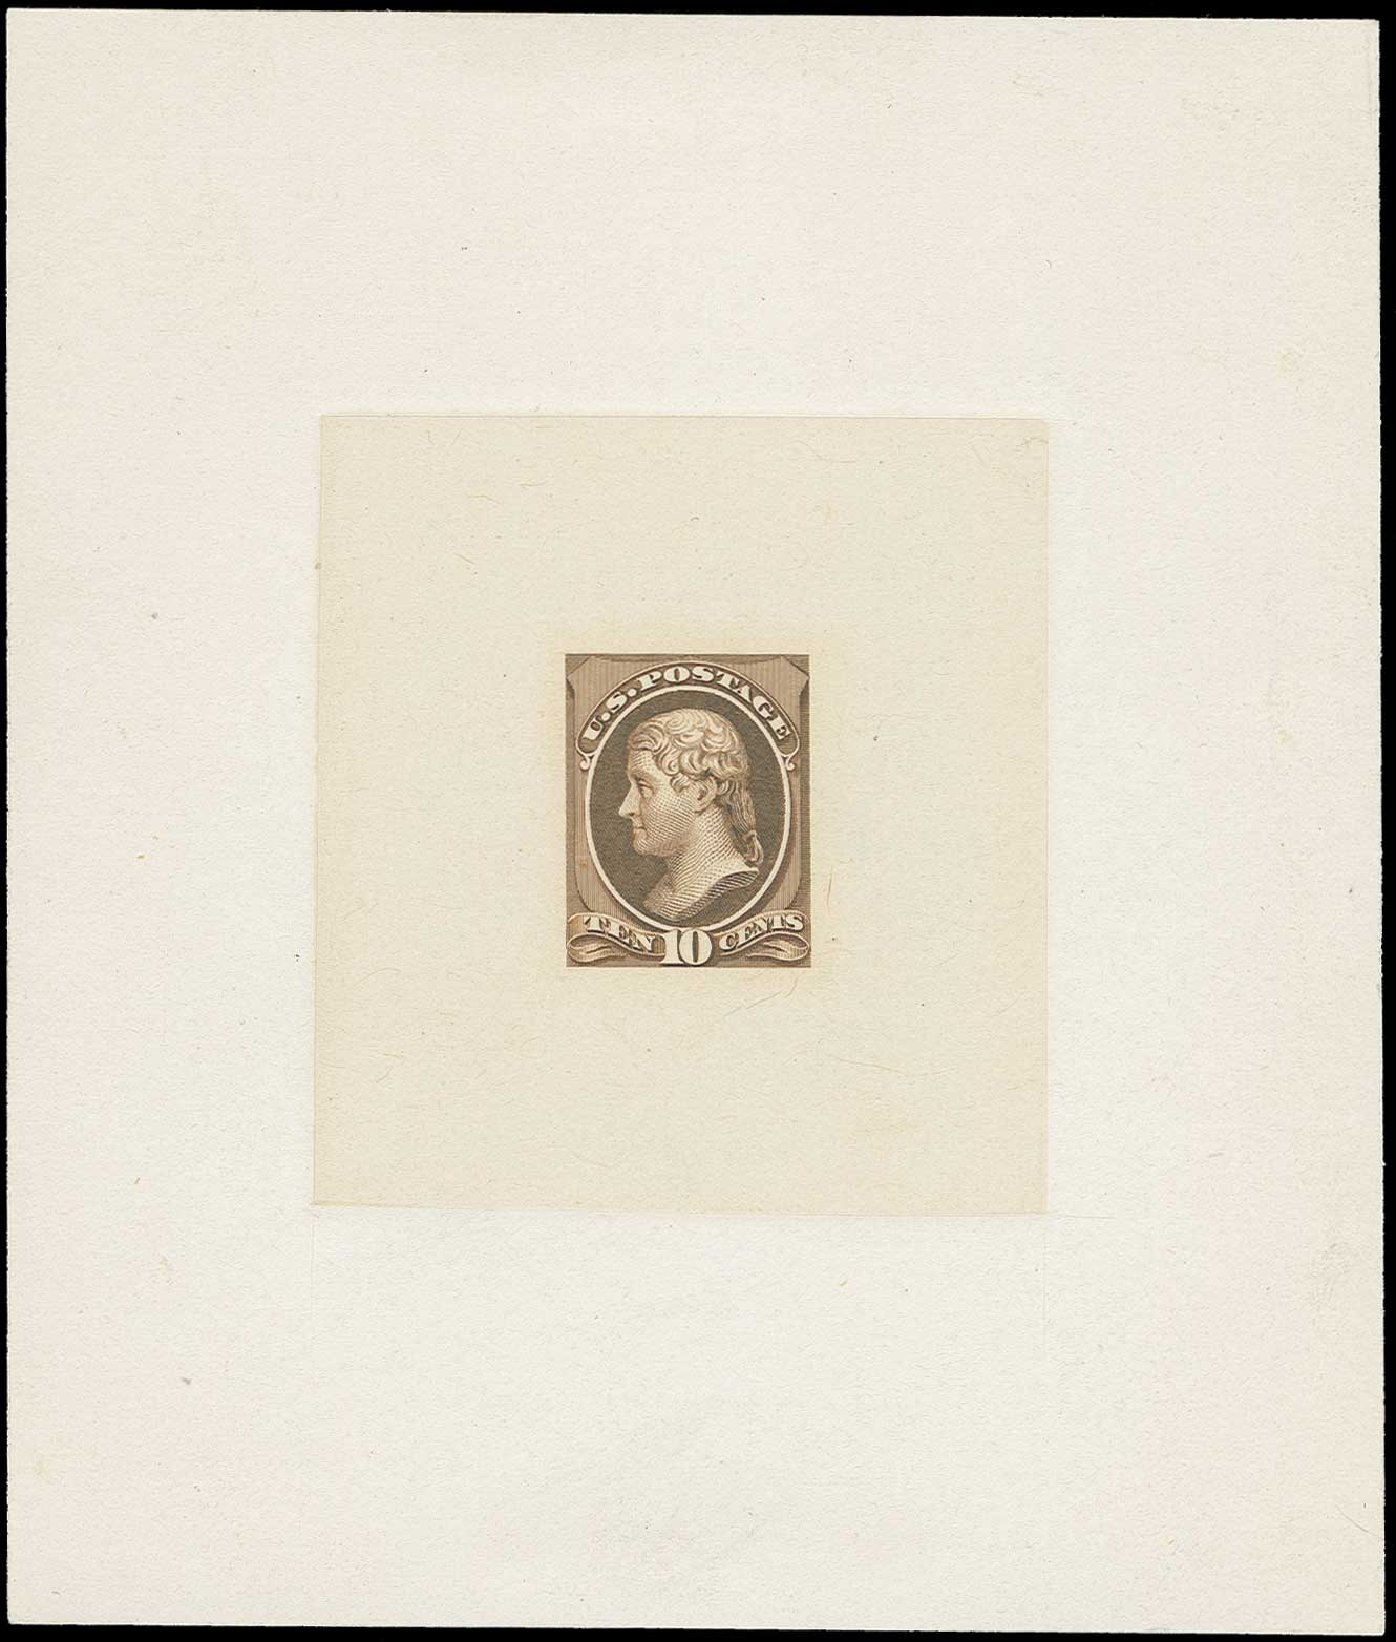 US Stamp Prices Scott #209 - 1882 10c Thomas Jefferson. H.R. Harmer, Jun 2015, Sale 3007, Lot 3041